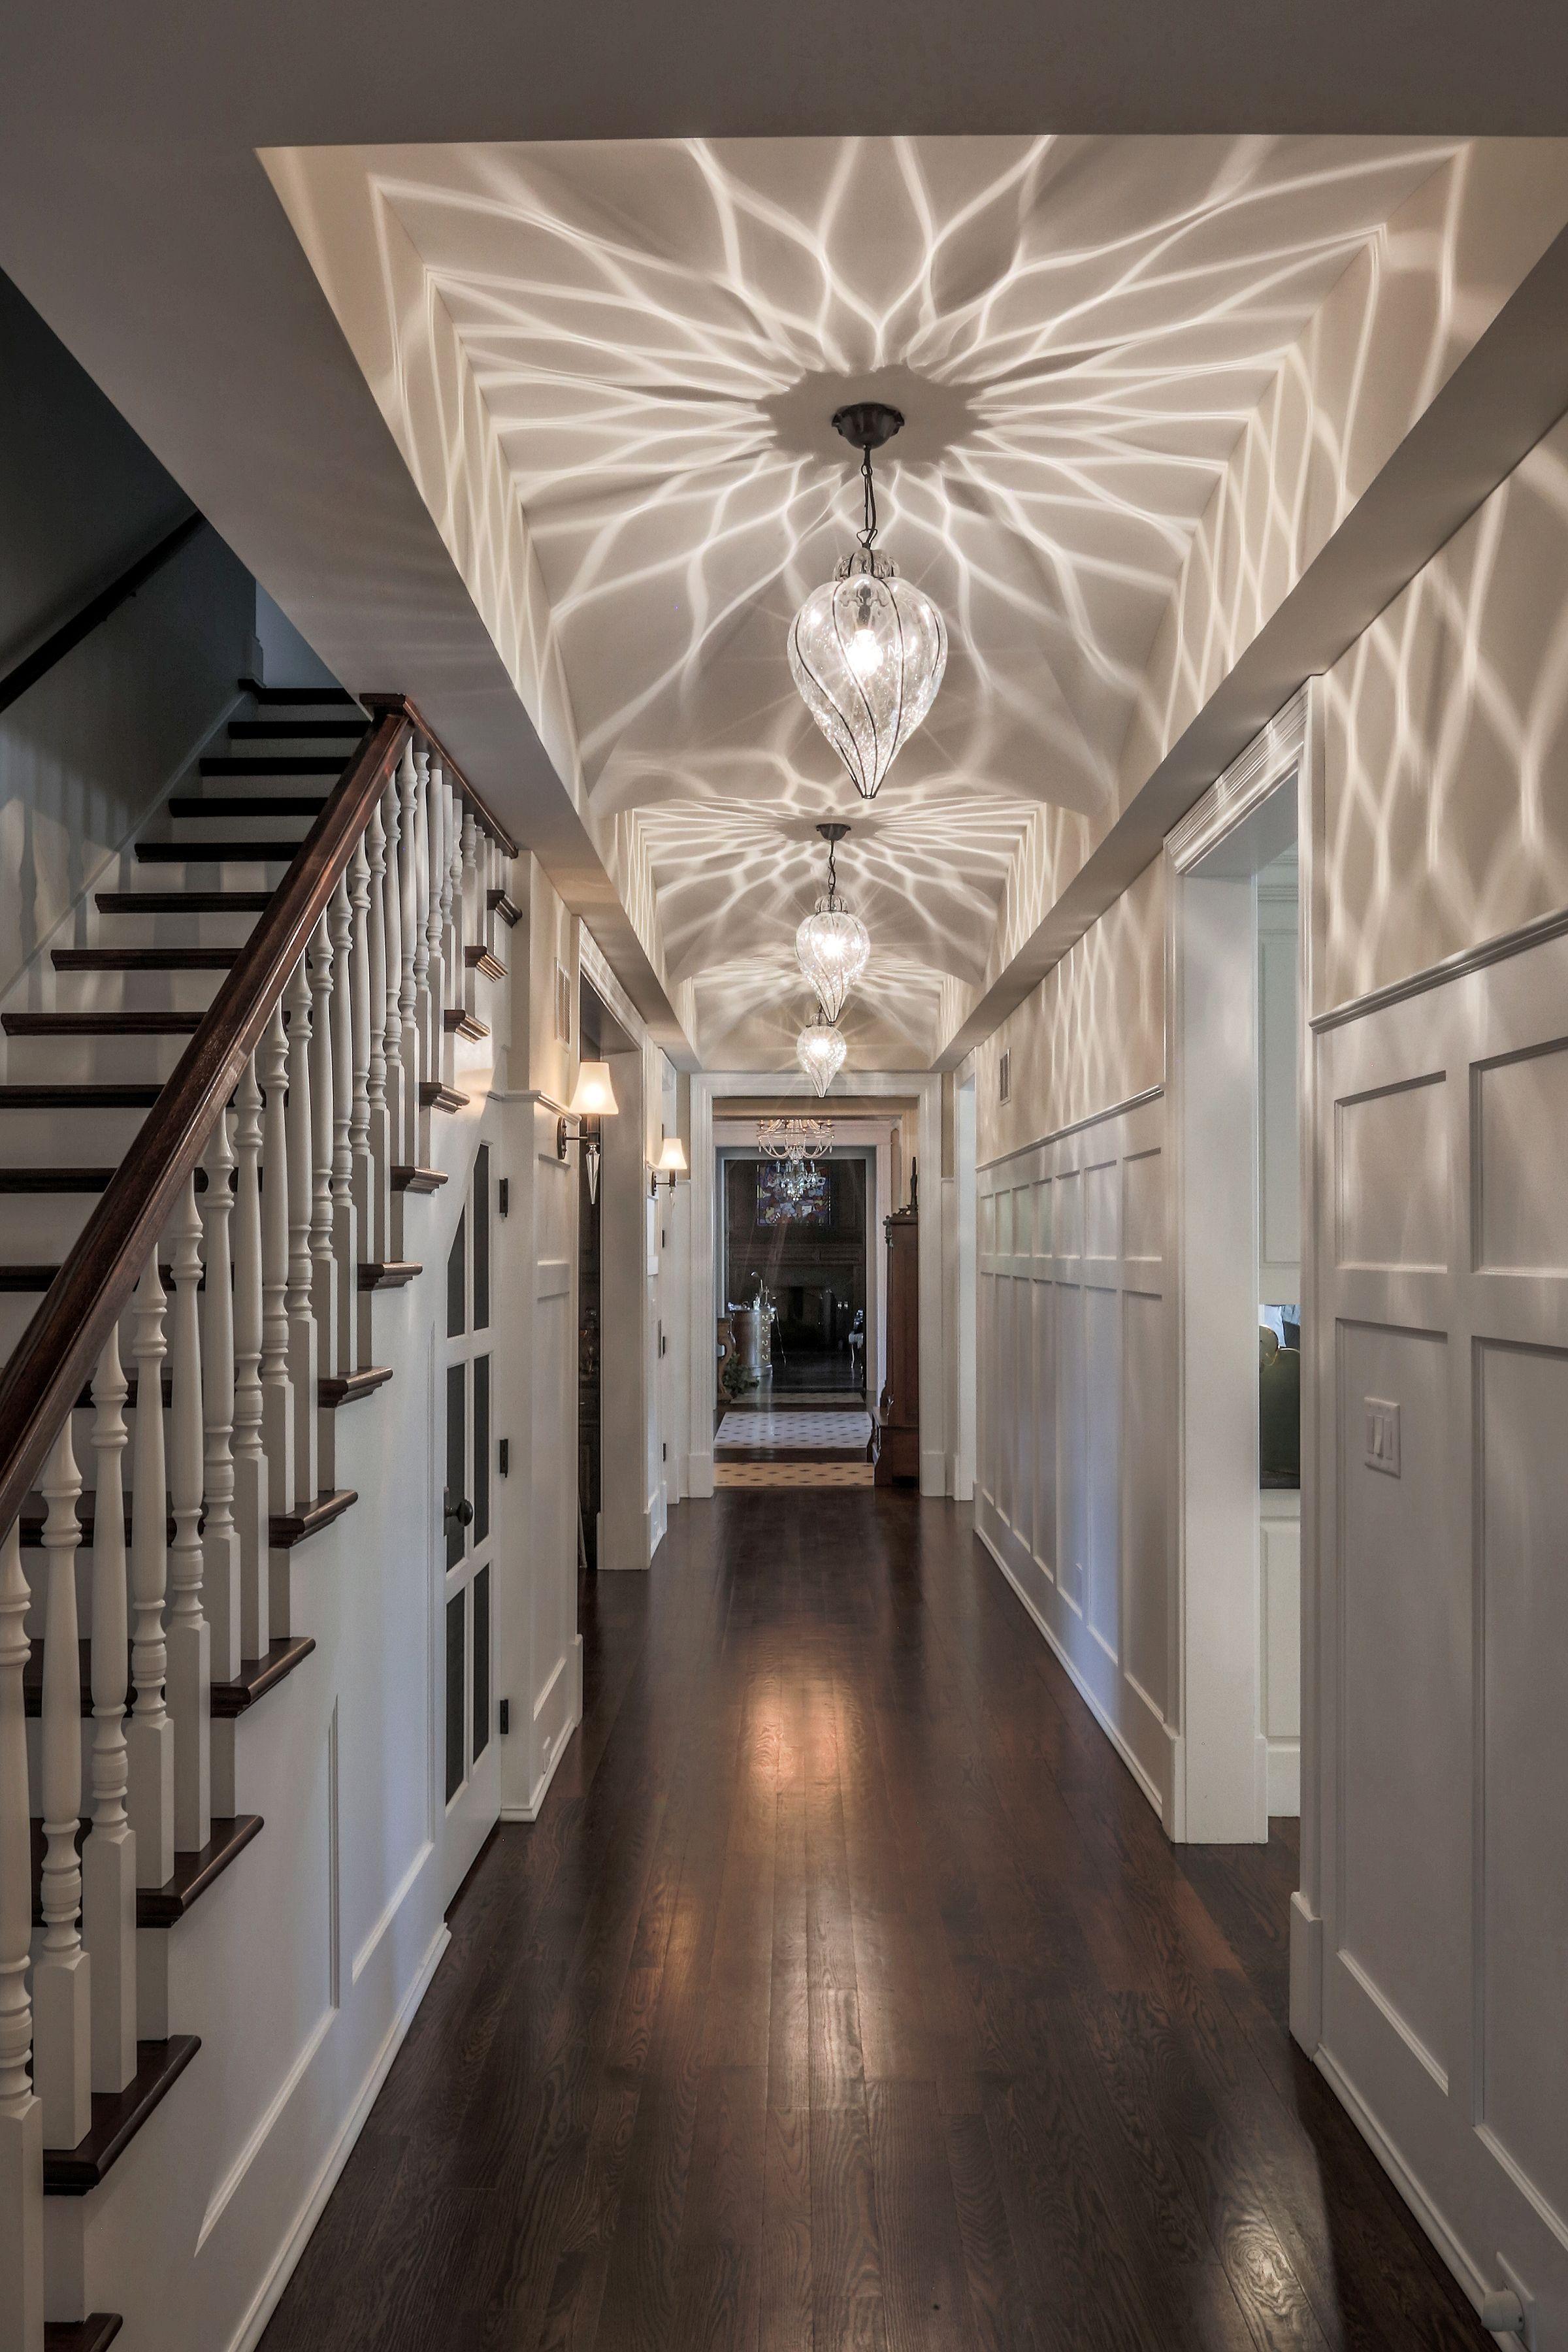 Goccia Pendant House Design Home Remodeling Dream House